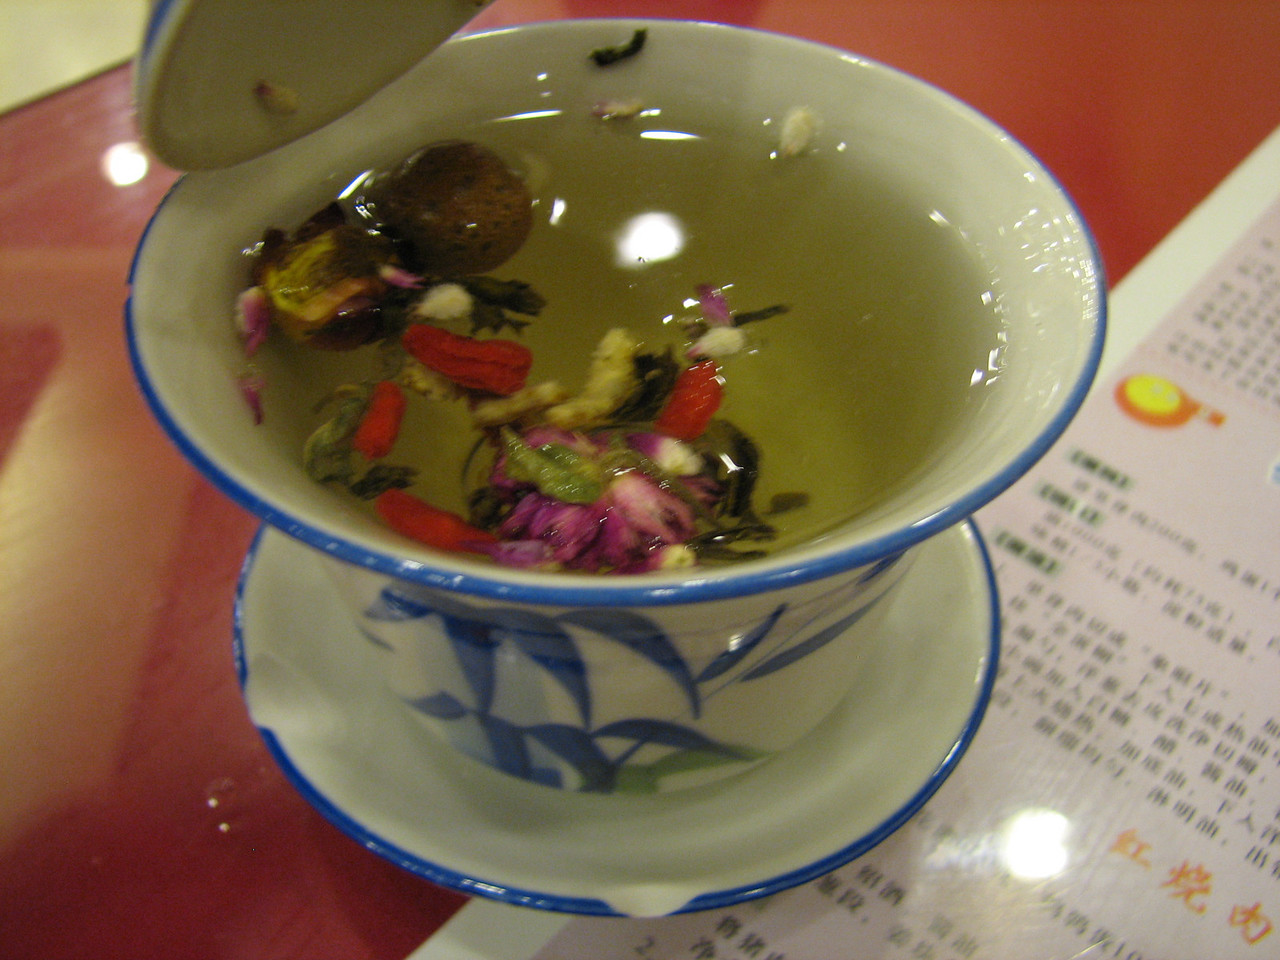 Delicious flower tea. Toward the end this had an almost cinnamon taste.